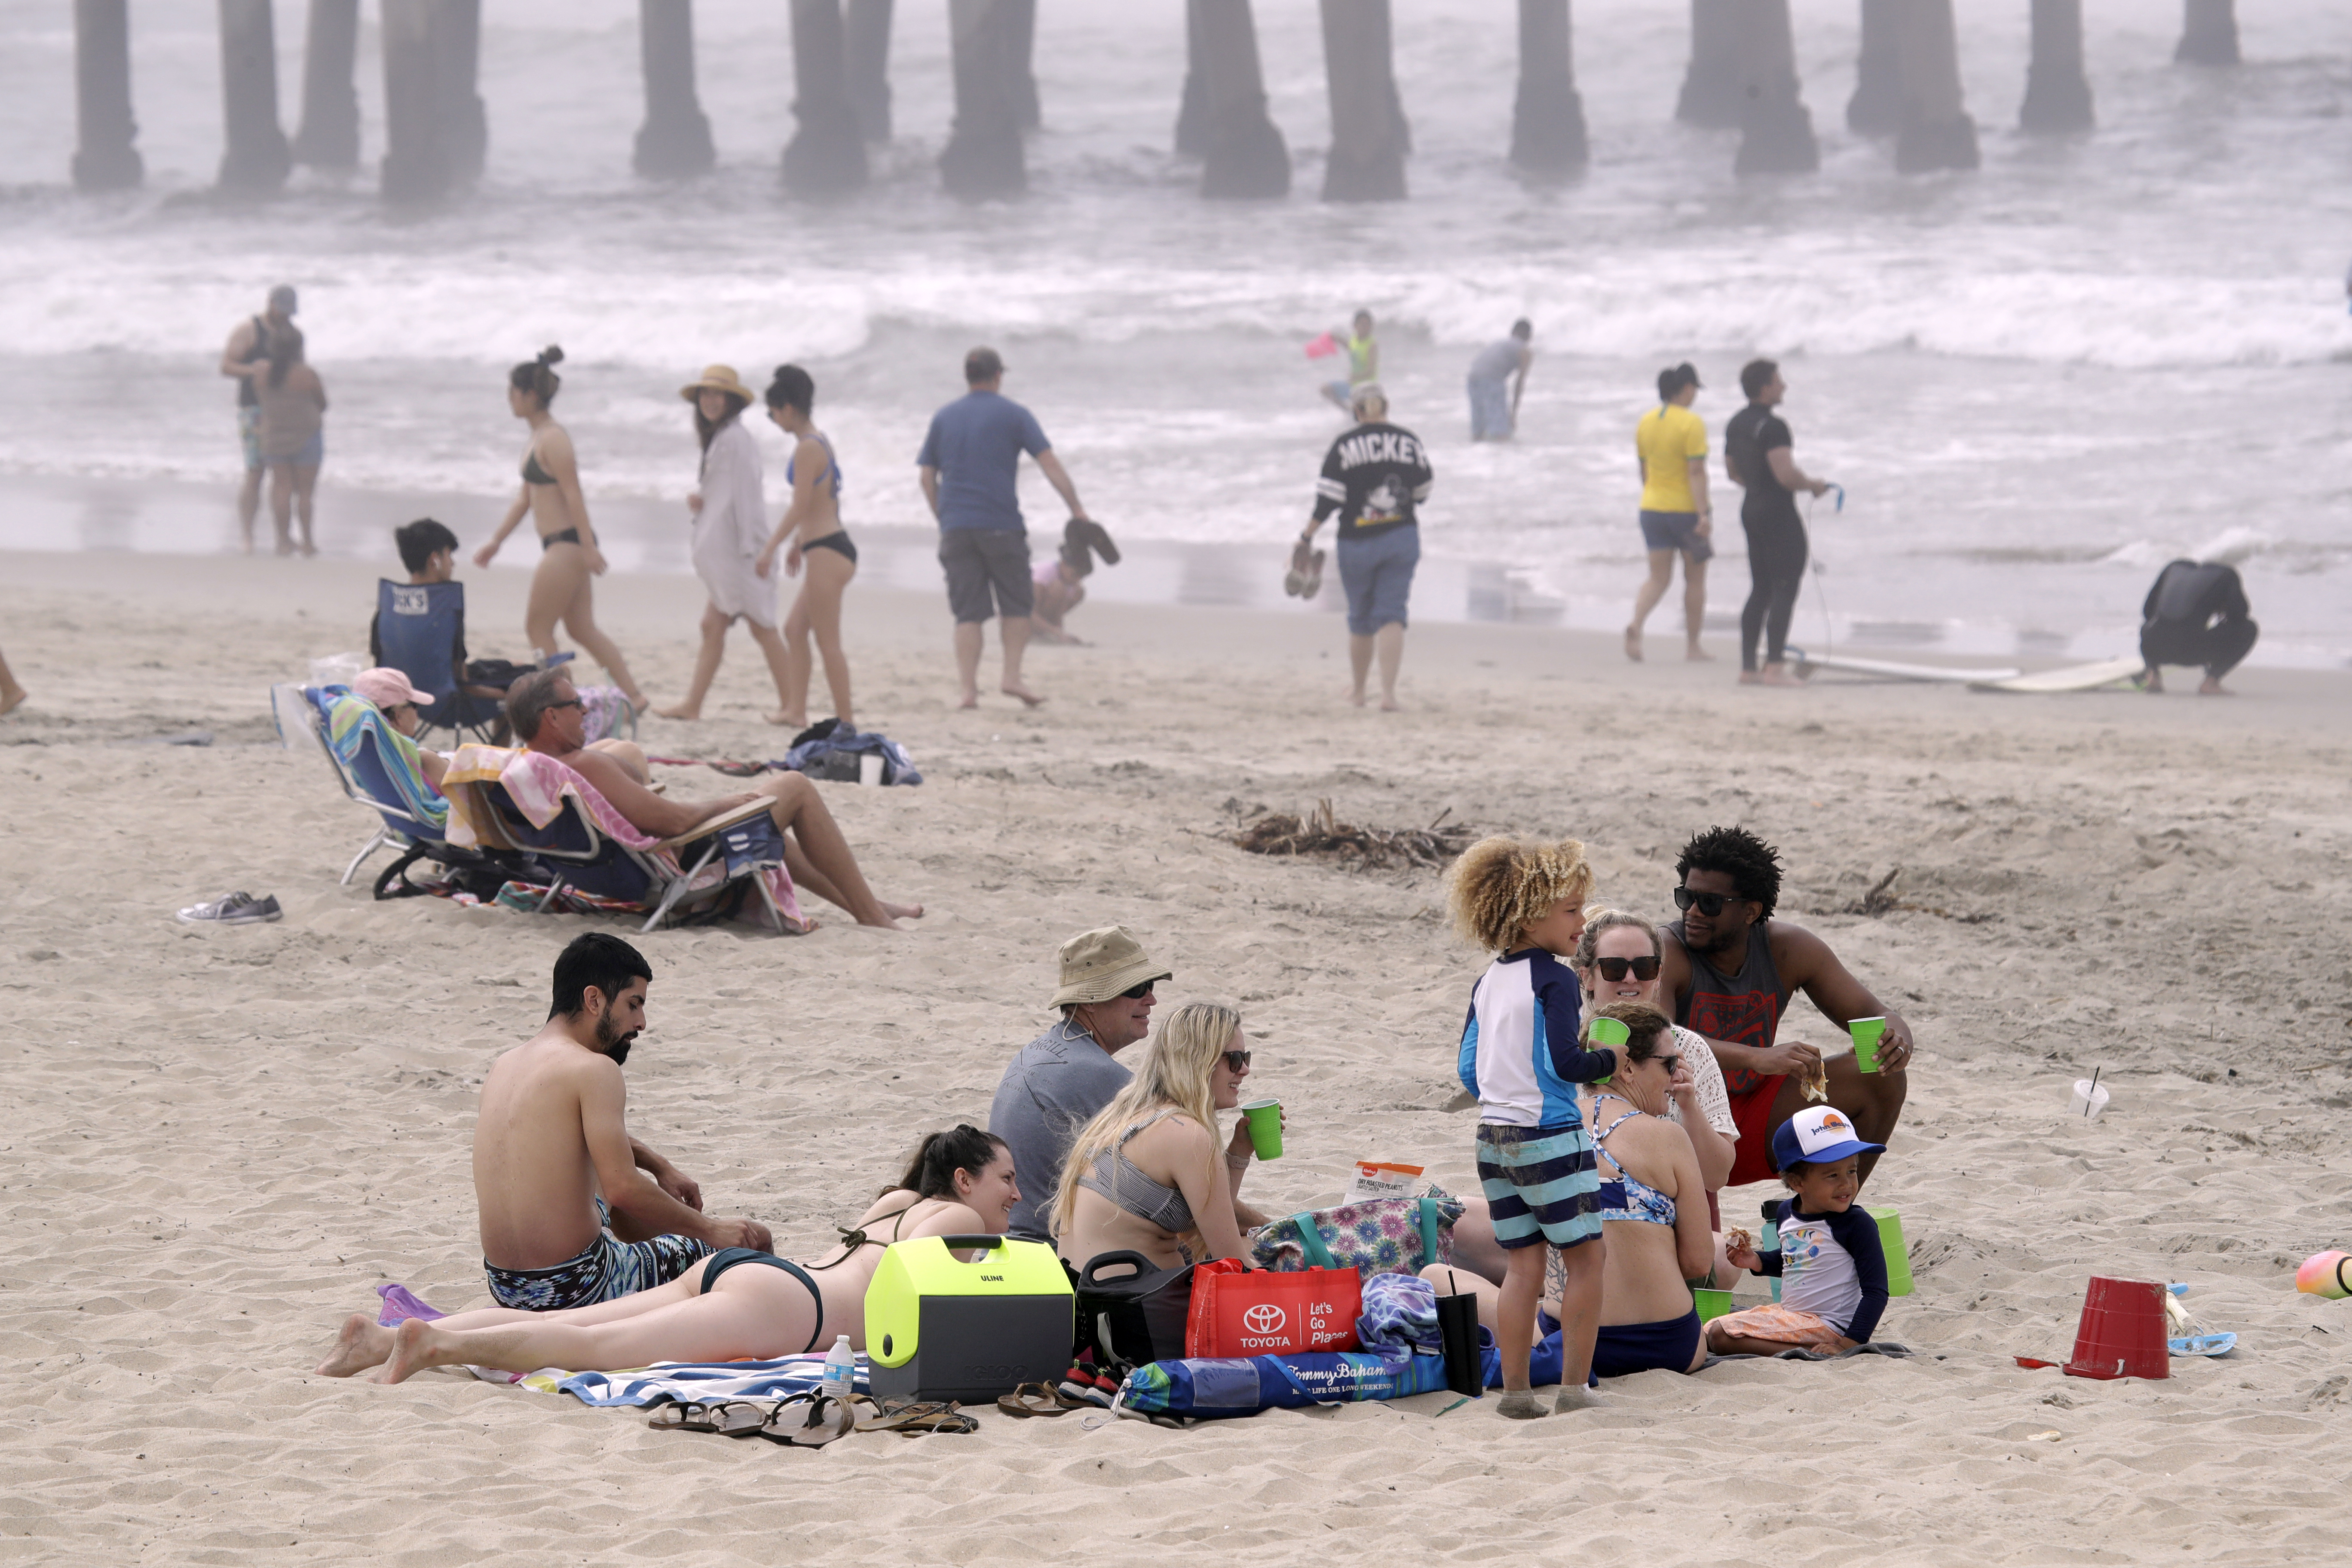 Widespread Heat May Soon Settle In For Long Haul Across Lower 48 The Washington Post 8:22 am pdt oct 27, 2020. 2